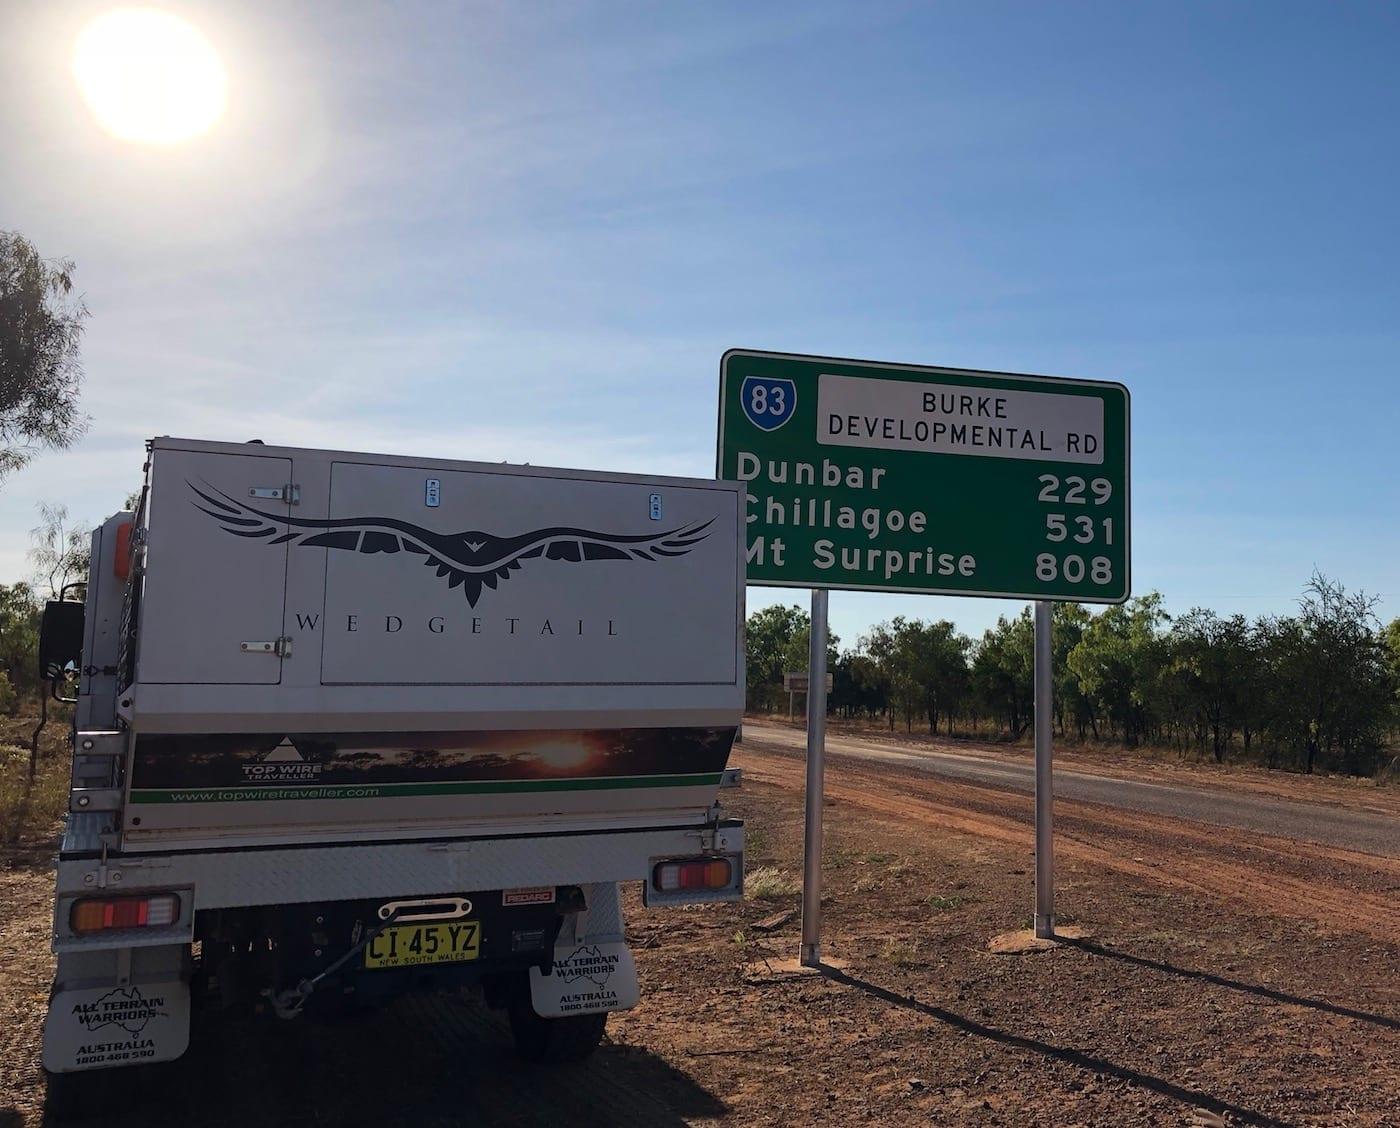 Truck camper beside road sign at start of BDR. Burke Developmental Road Conditions.